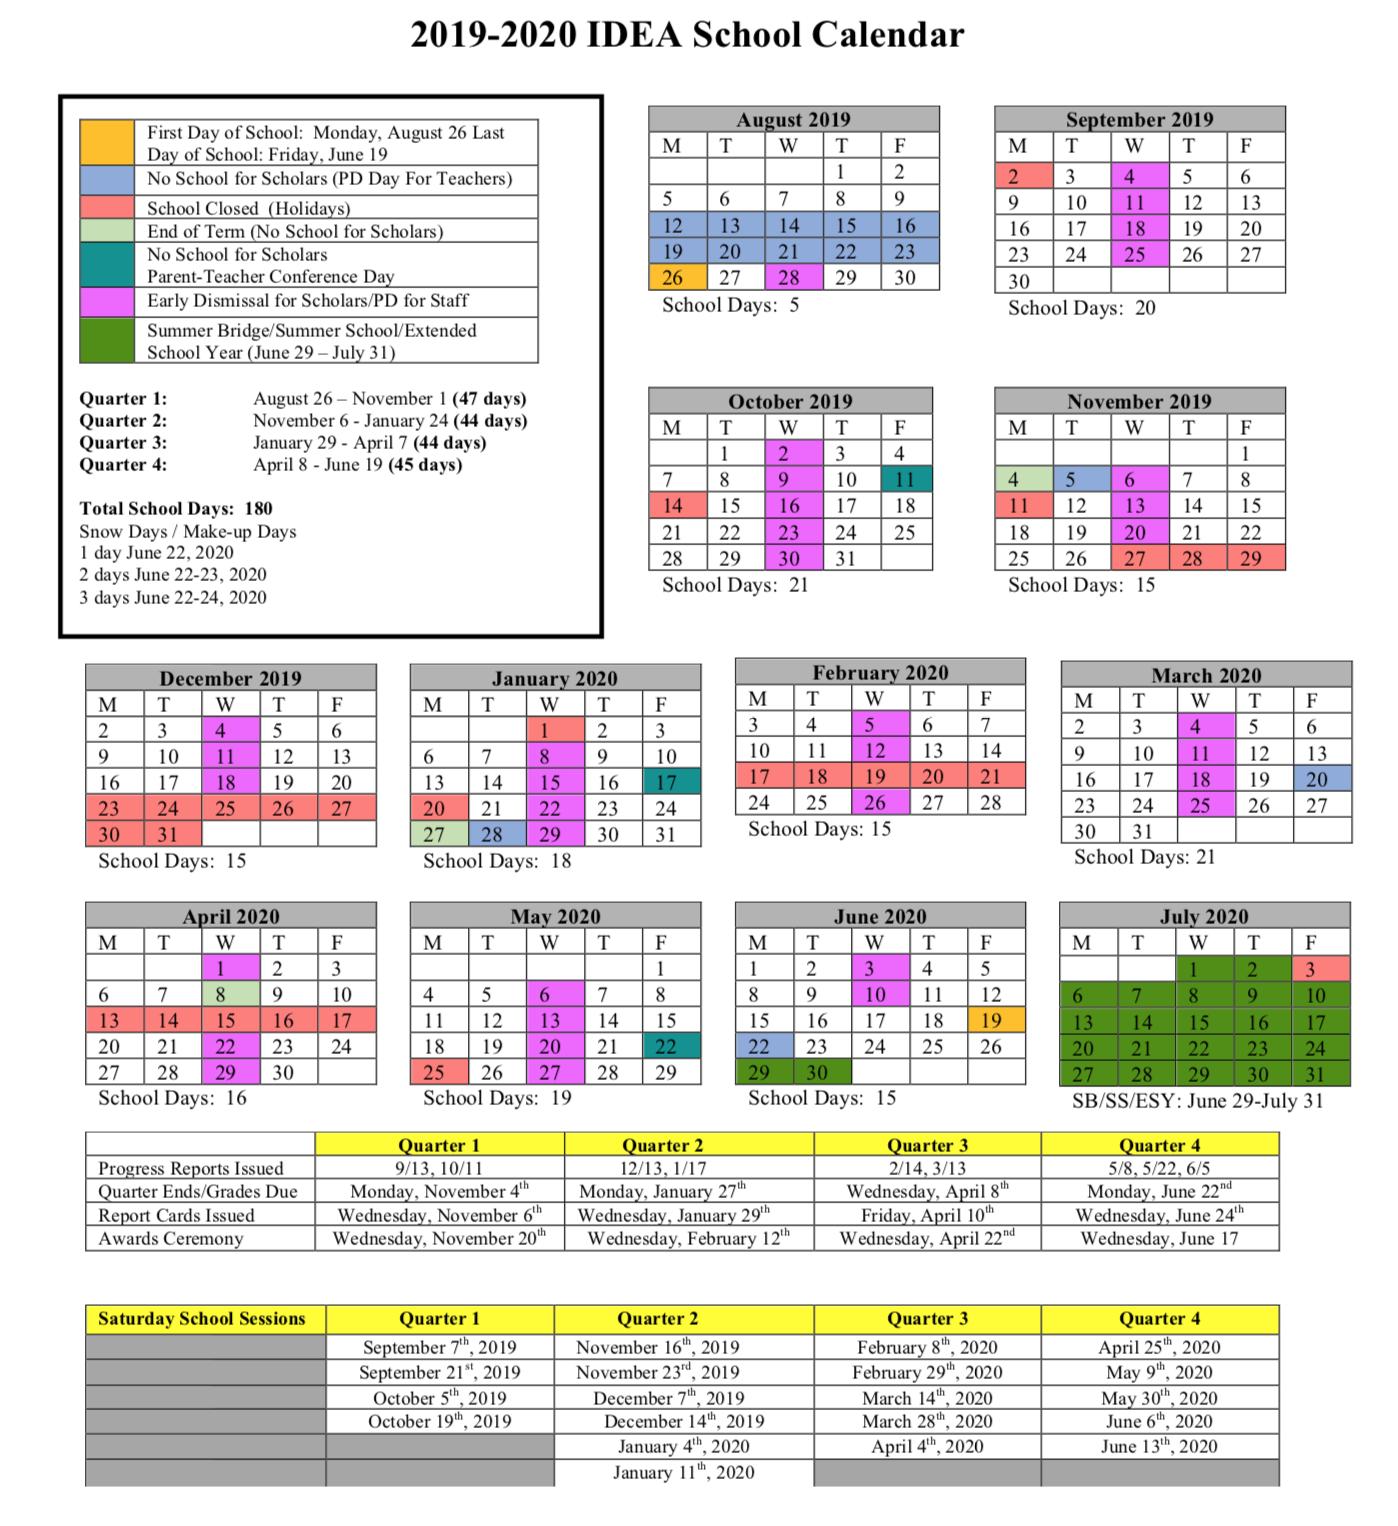 Pgcc Calendar 2020 2019 2020 Calendar | IDEA Public Charter School